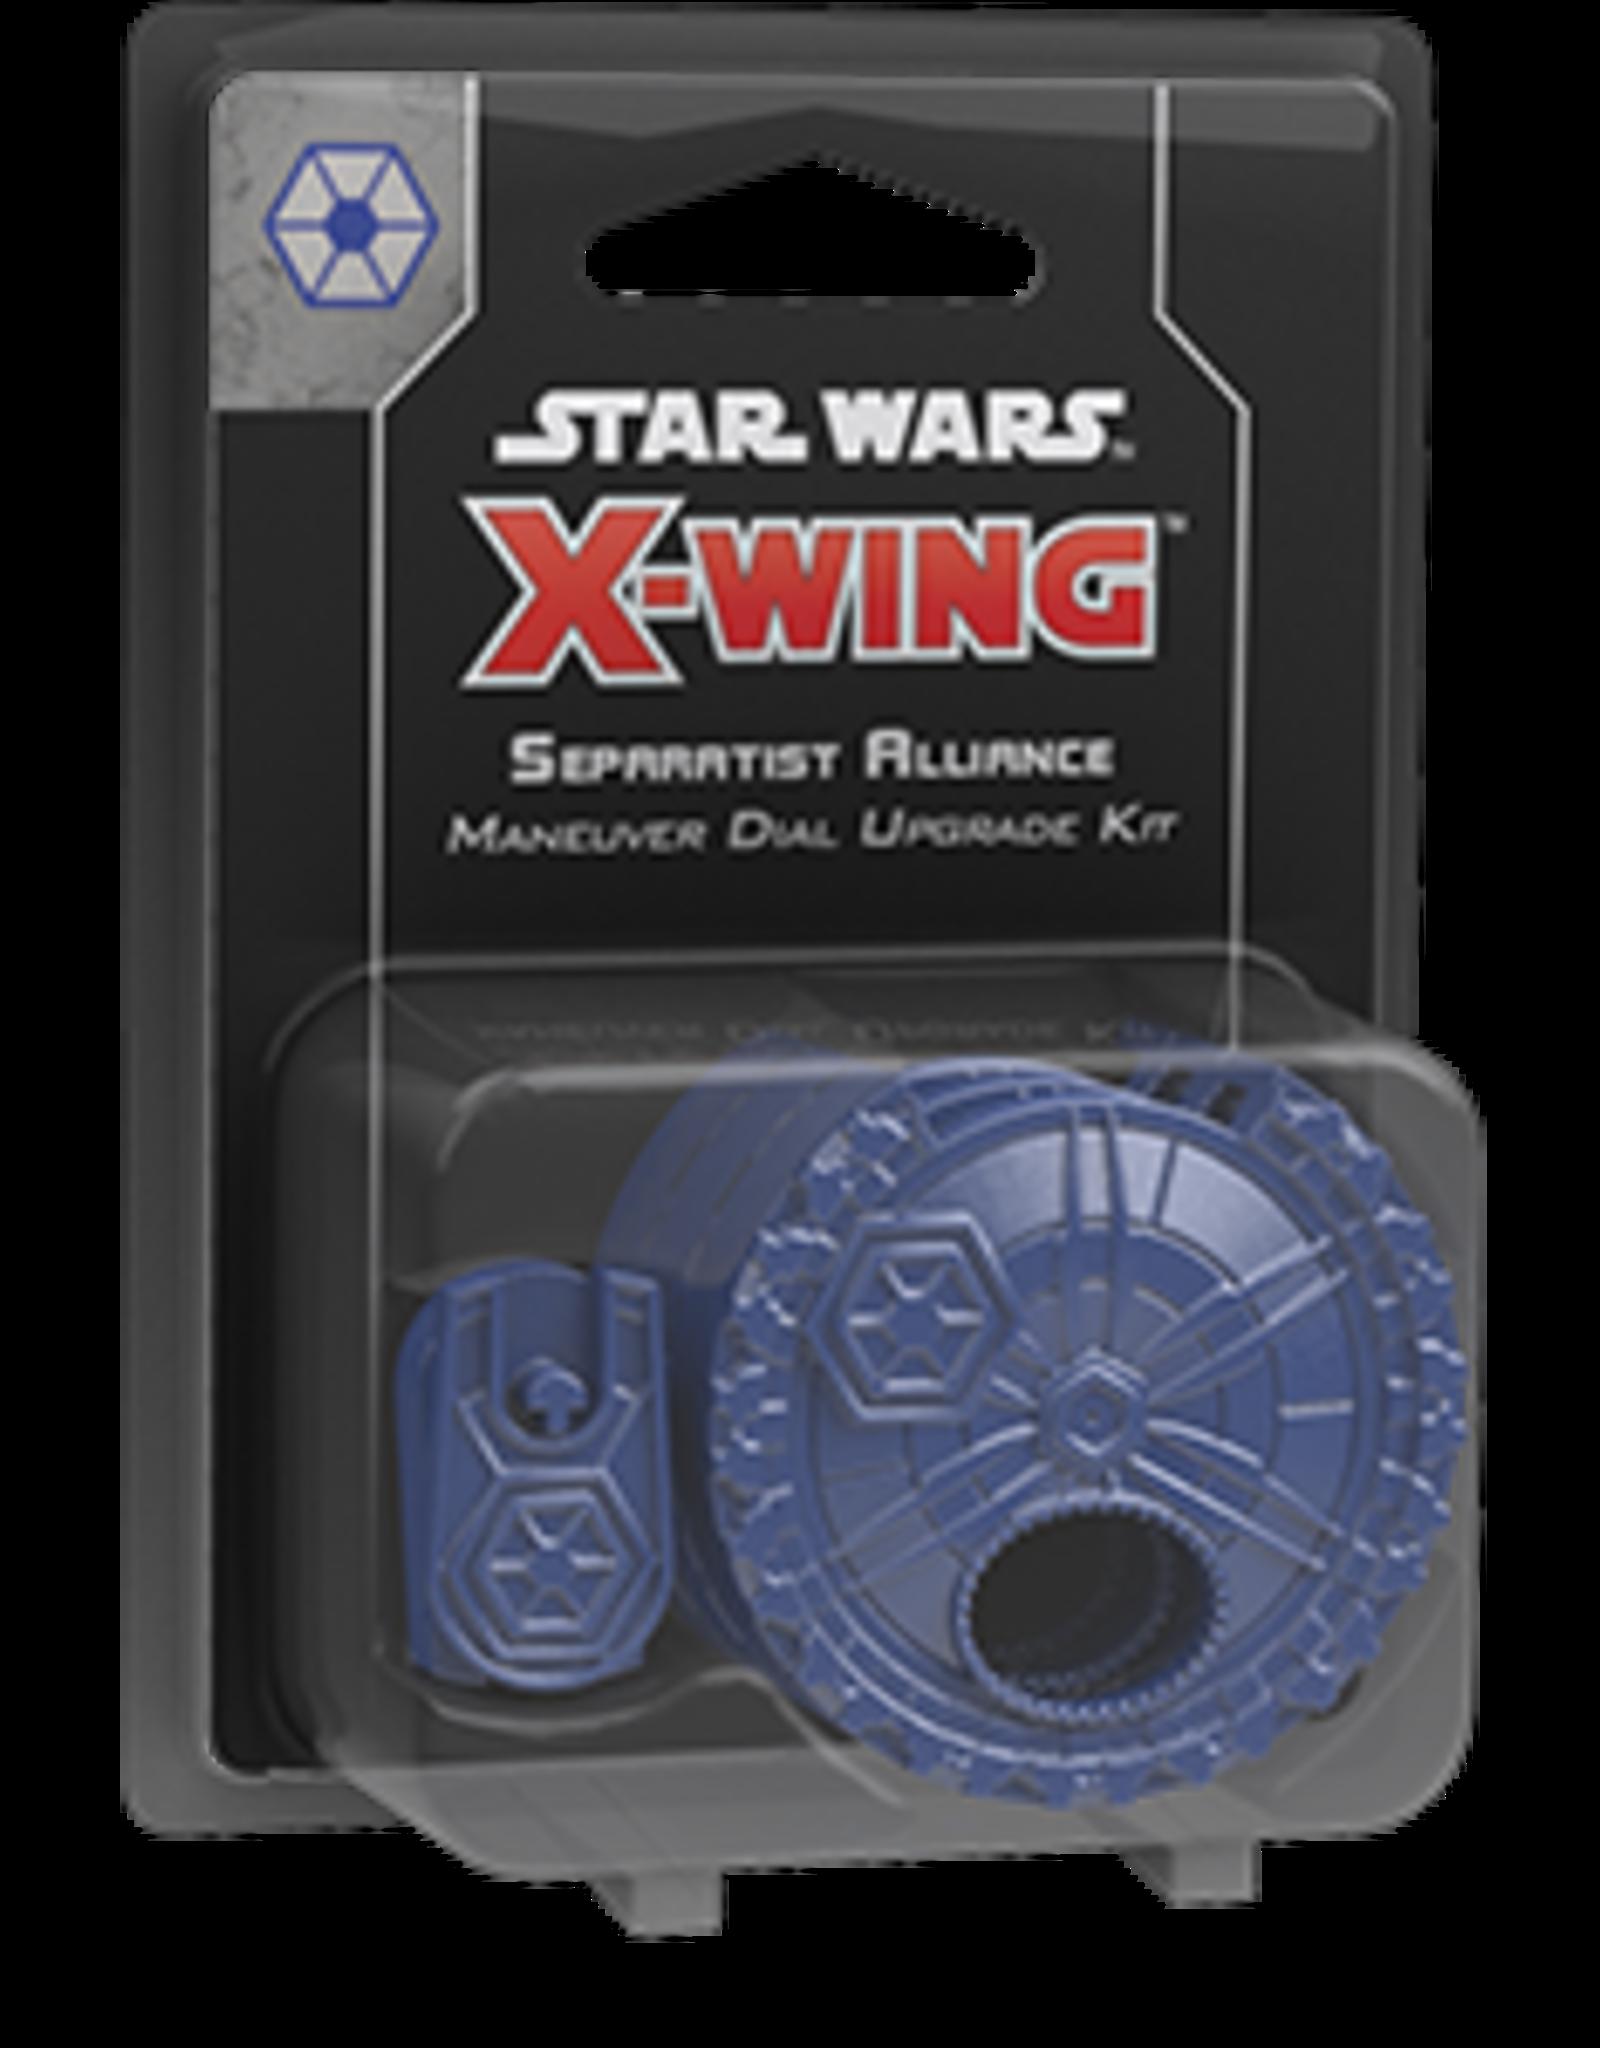 FFG Star Wars X-Wing 2.0: Seperatist Alliance Maneuver Dial Upgrade Kit